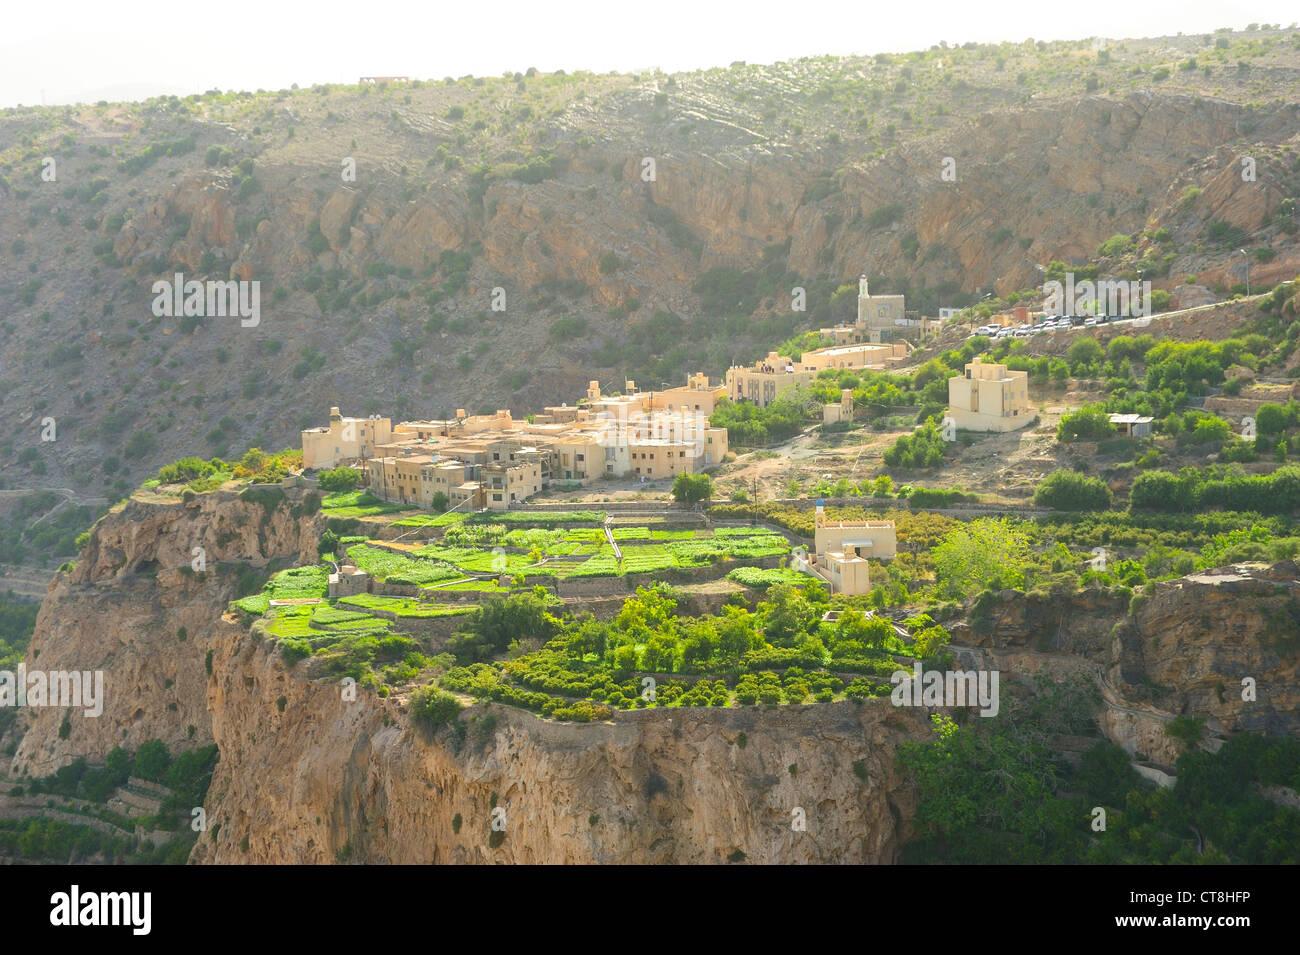 Village of Al Ayn, Sayq Plateau, Western Hajar Mountains, Oman - Stock Image